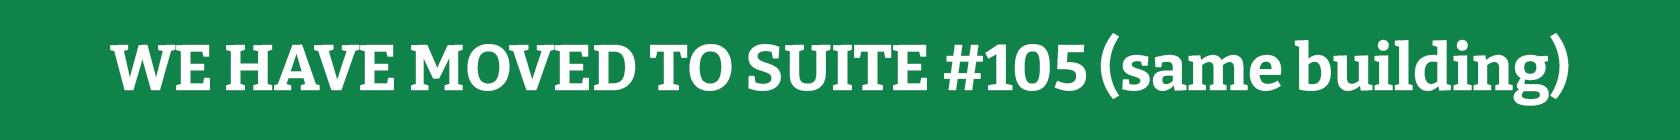 Beaverton Accounting Firm | Abbot Tax Service, Inc.